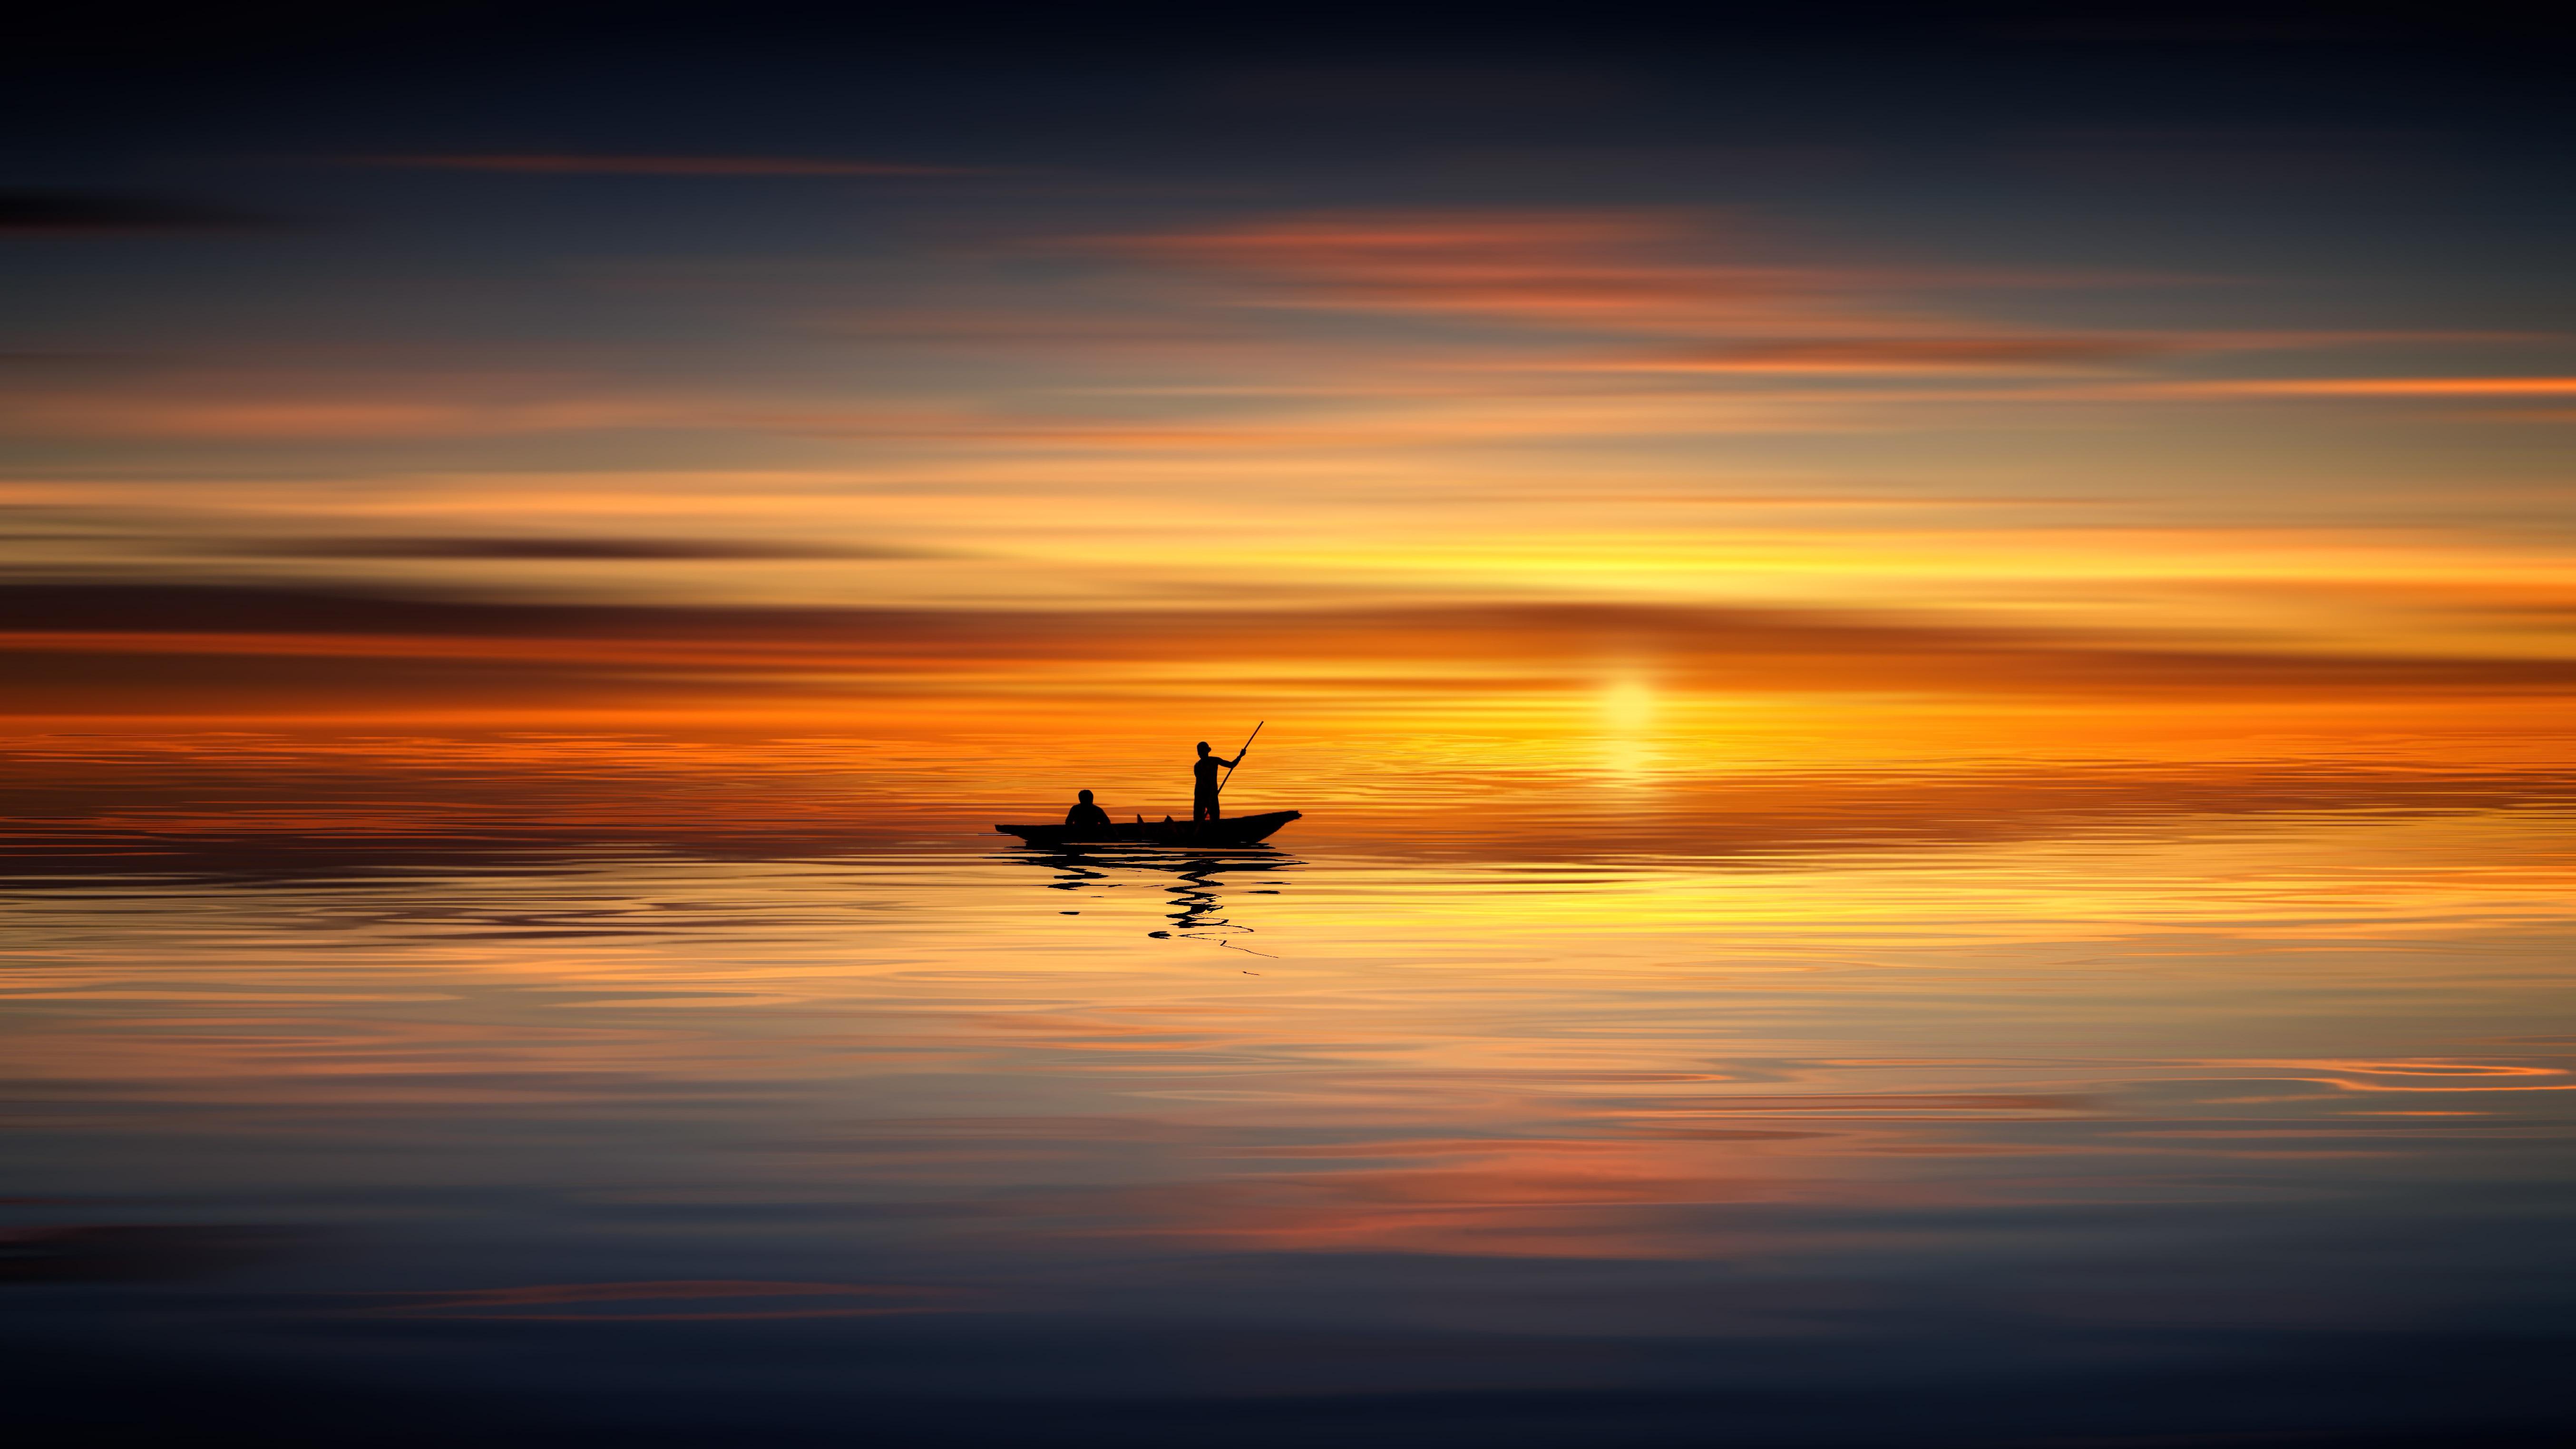 Wallpaper 3d Buat Android Boat Ocean Sunset Landscape 5k Hd Photography 4k